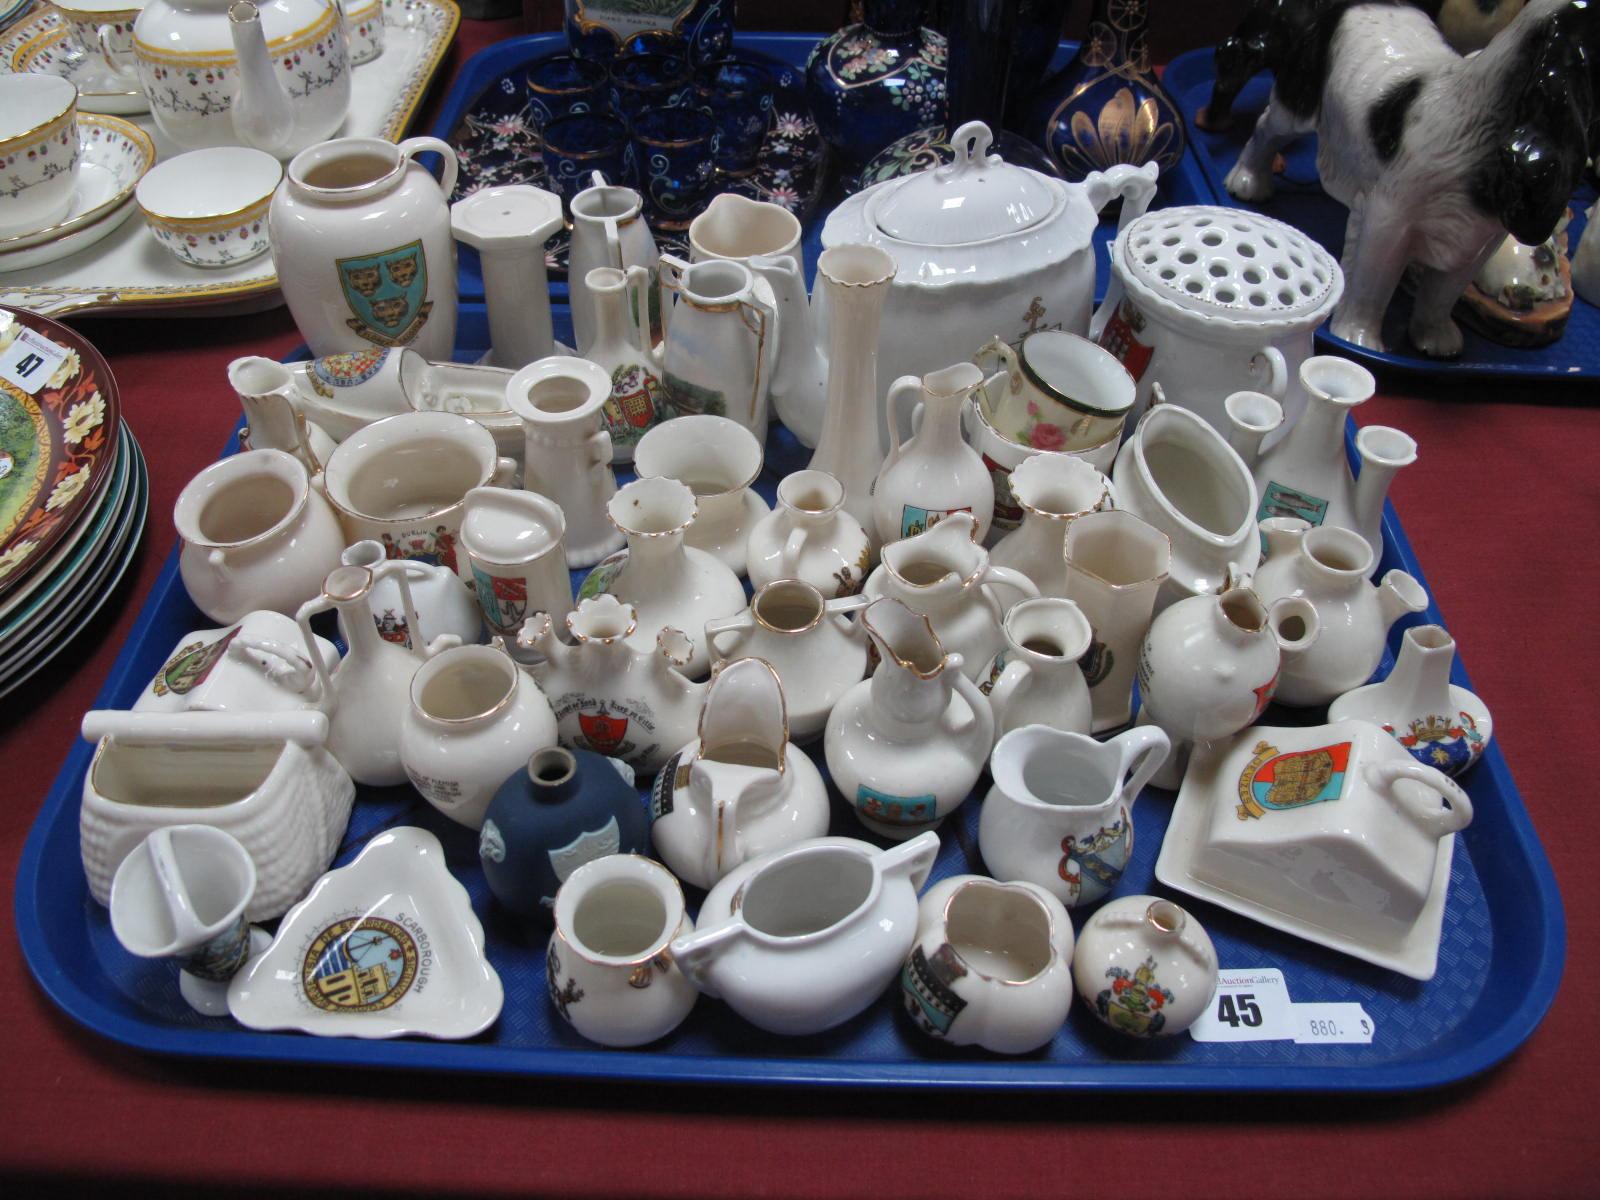 Lot 45 - A Goss Pitcher, Southport teapot, Goss Jersey fish basket, Carlton cauldron, Wedgwood Wellington